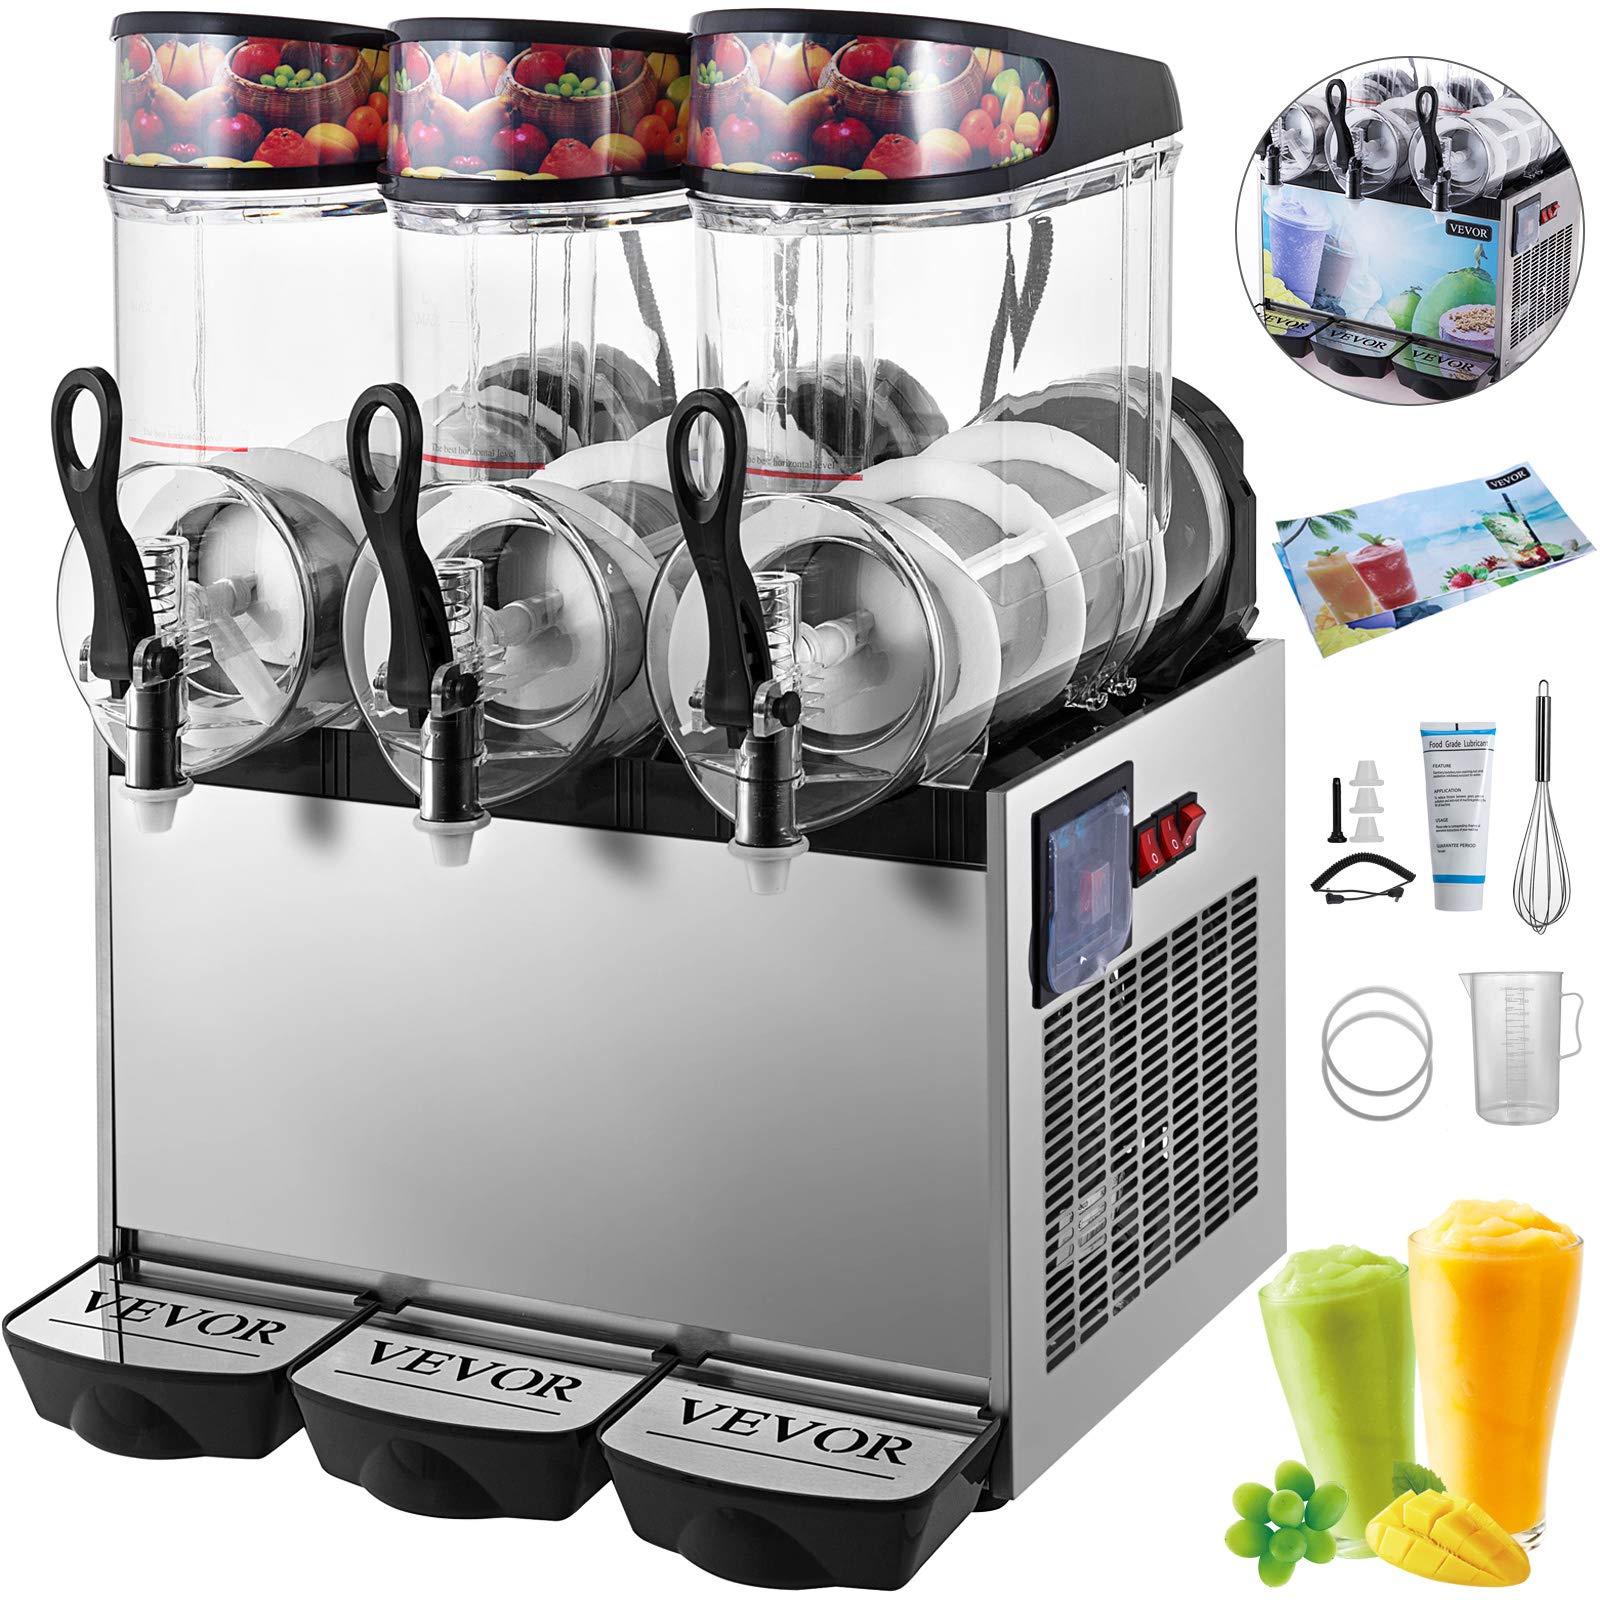 VEVOR 110V Slushy Machine 12L*3 Triple-Bowl Slush Frozen Drink Machine 900W Frozen Drink Maker Ice Slushies for Supermarkets Cafes Restaurants Snack Bars Commercial Use